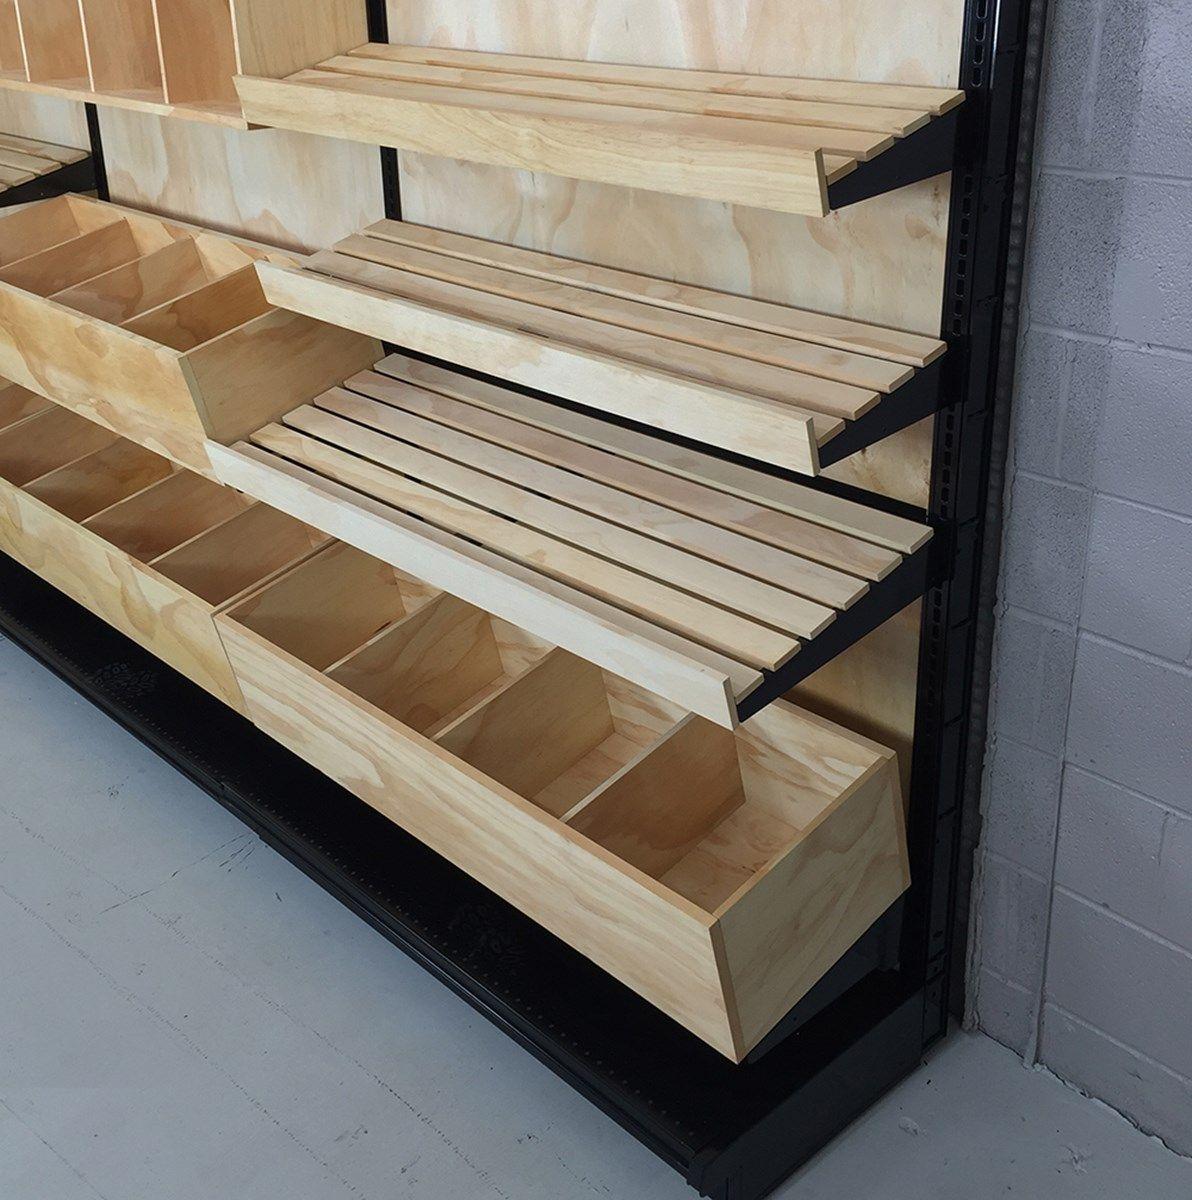 Wood Slat Shelving Bakery Display